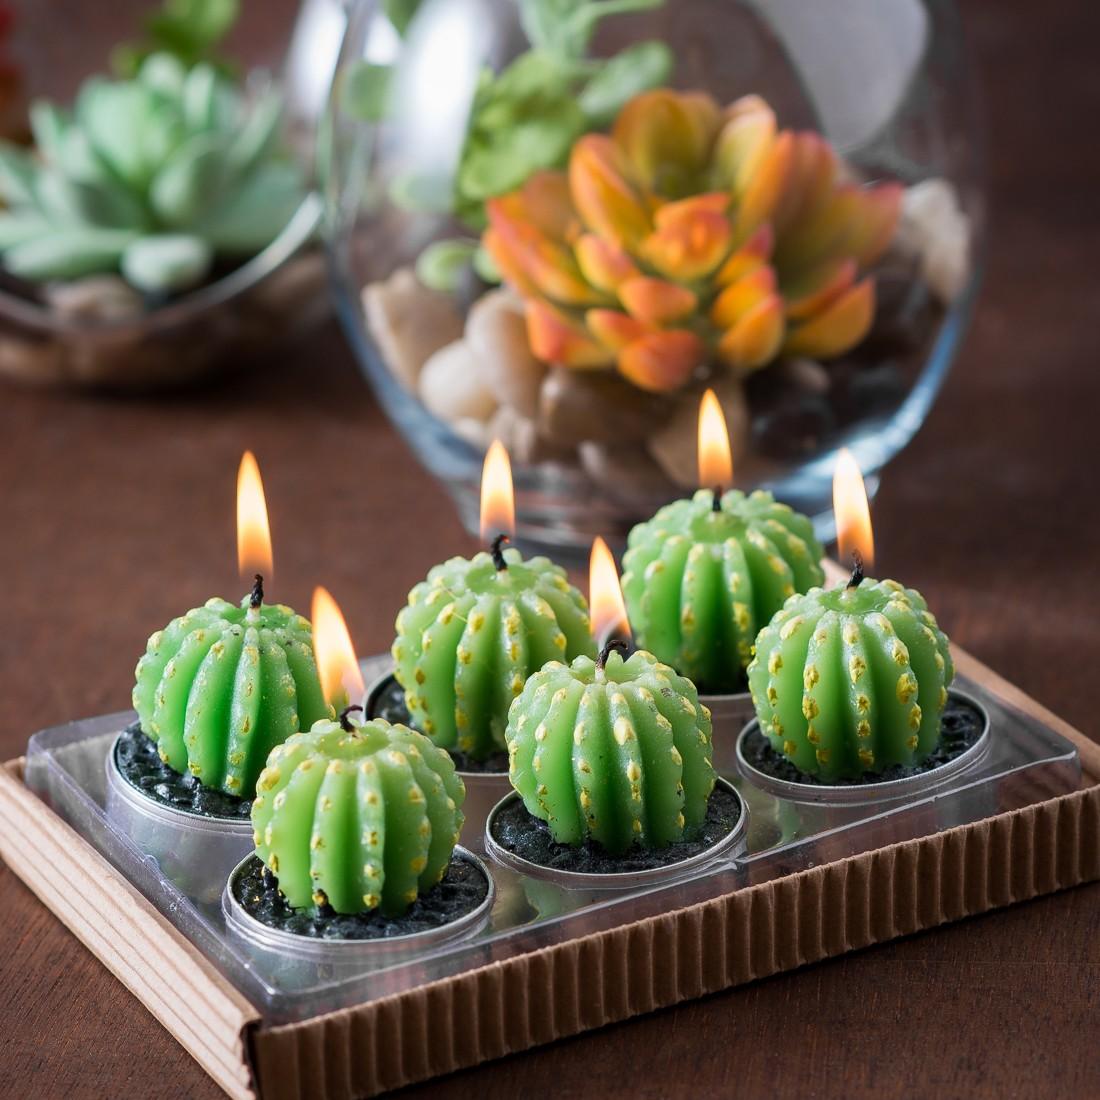 Barrel Cactus Tealights in Gift Box